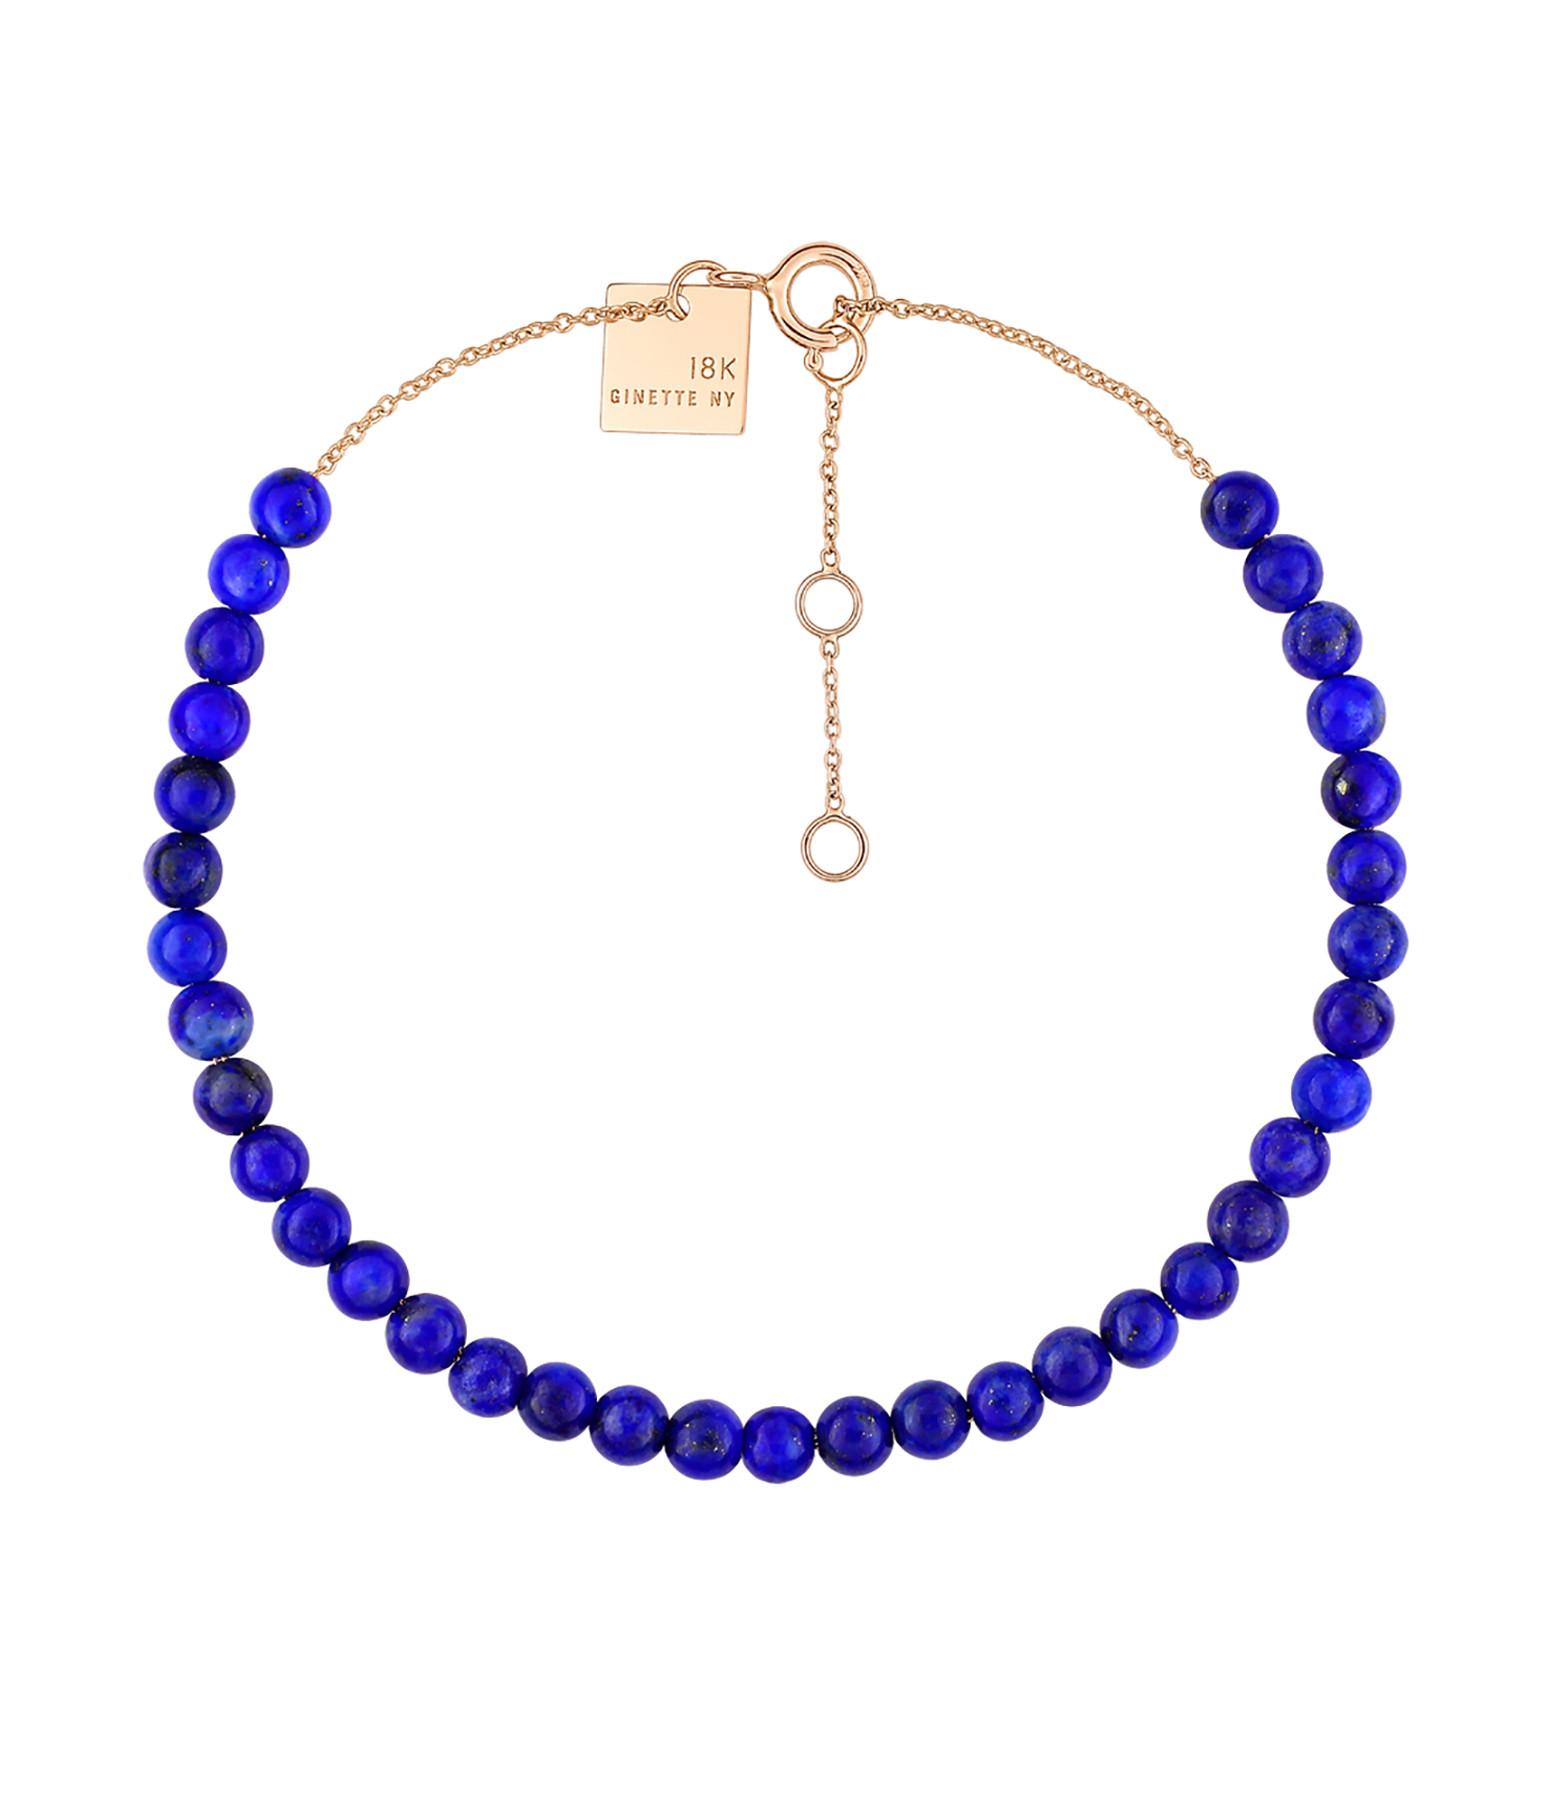 GINETTE NY - Bracelet Maria Mini Or Rose Lapis Lazuli